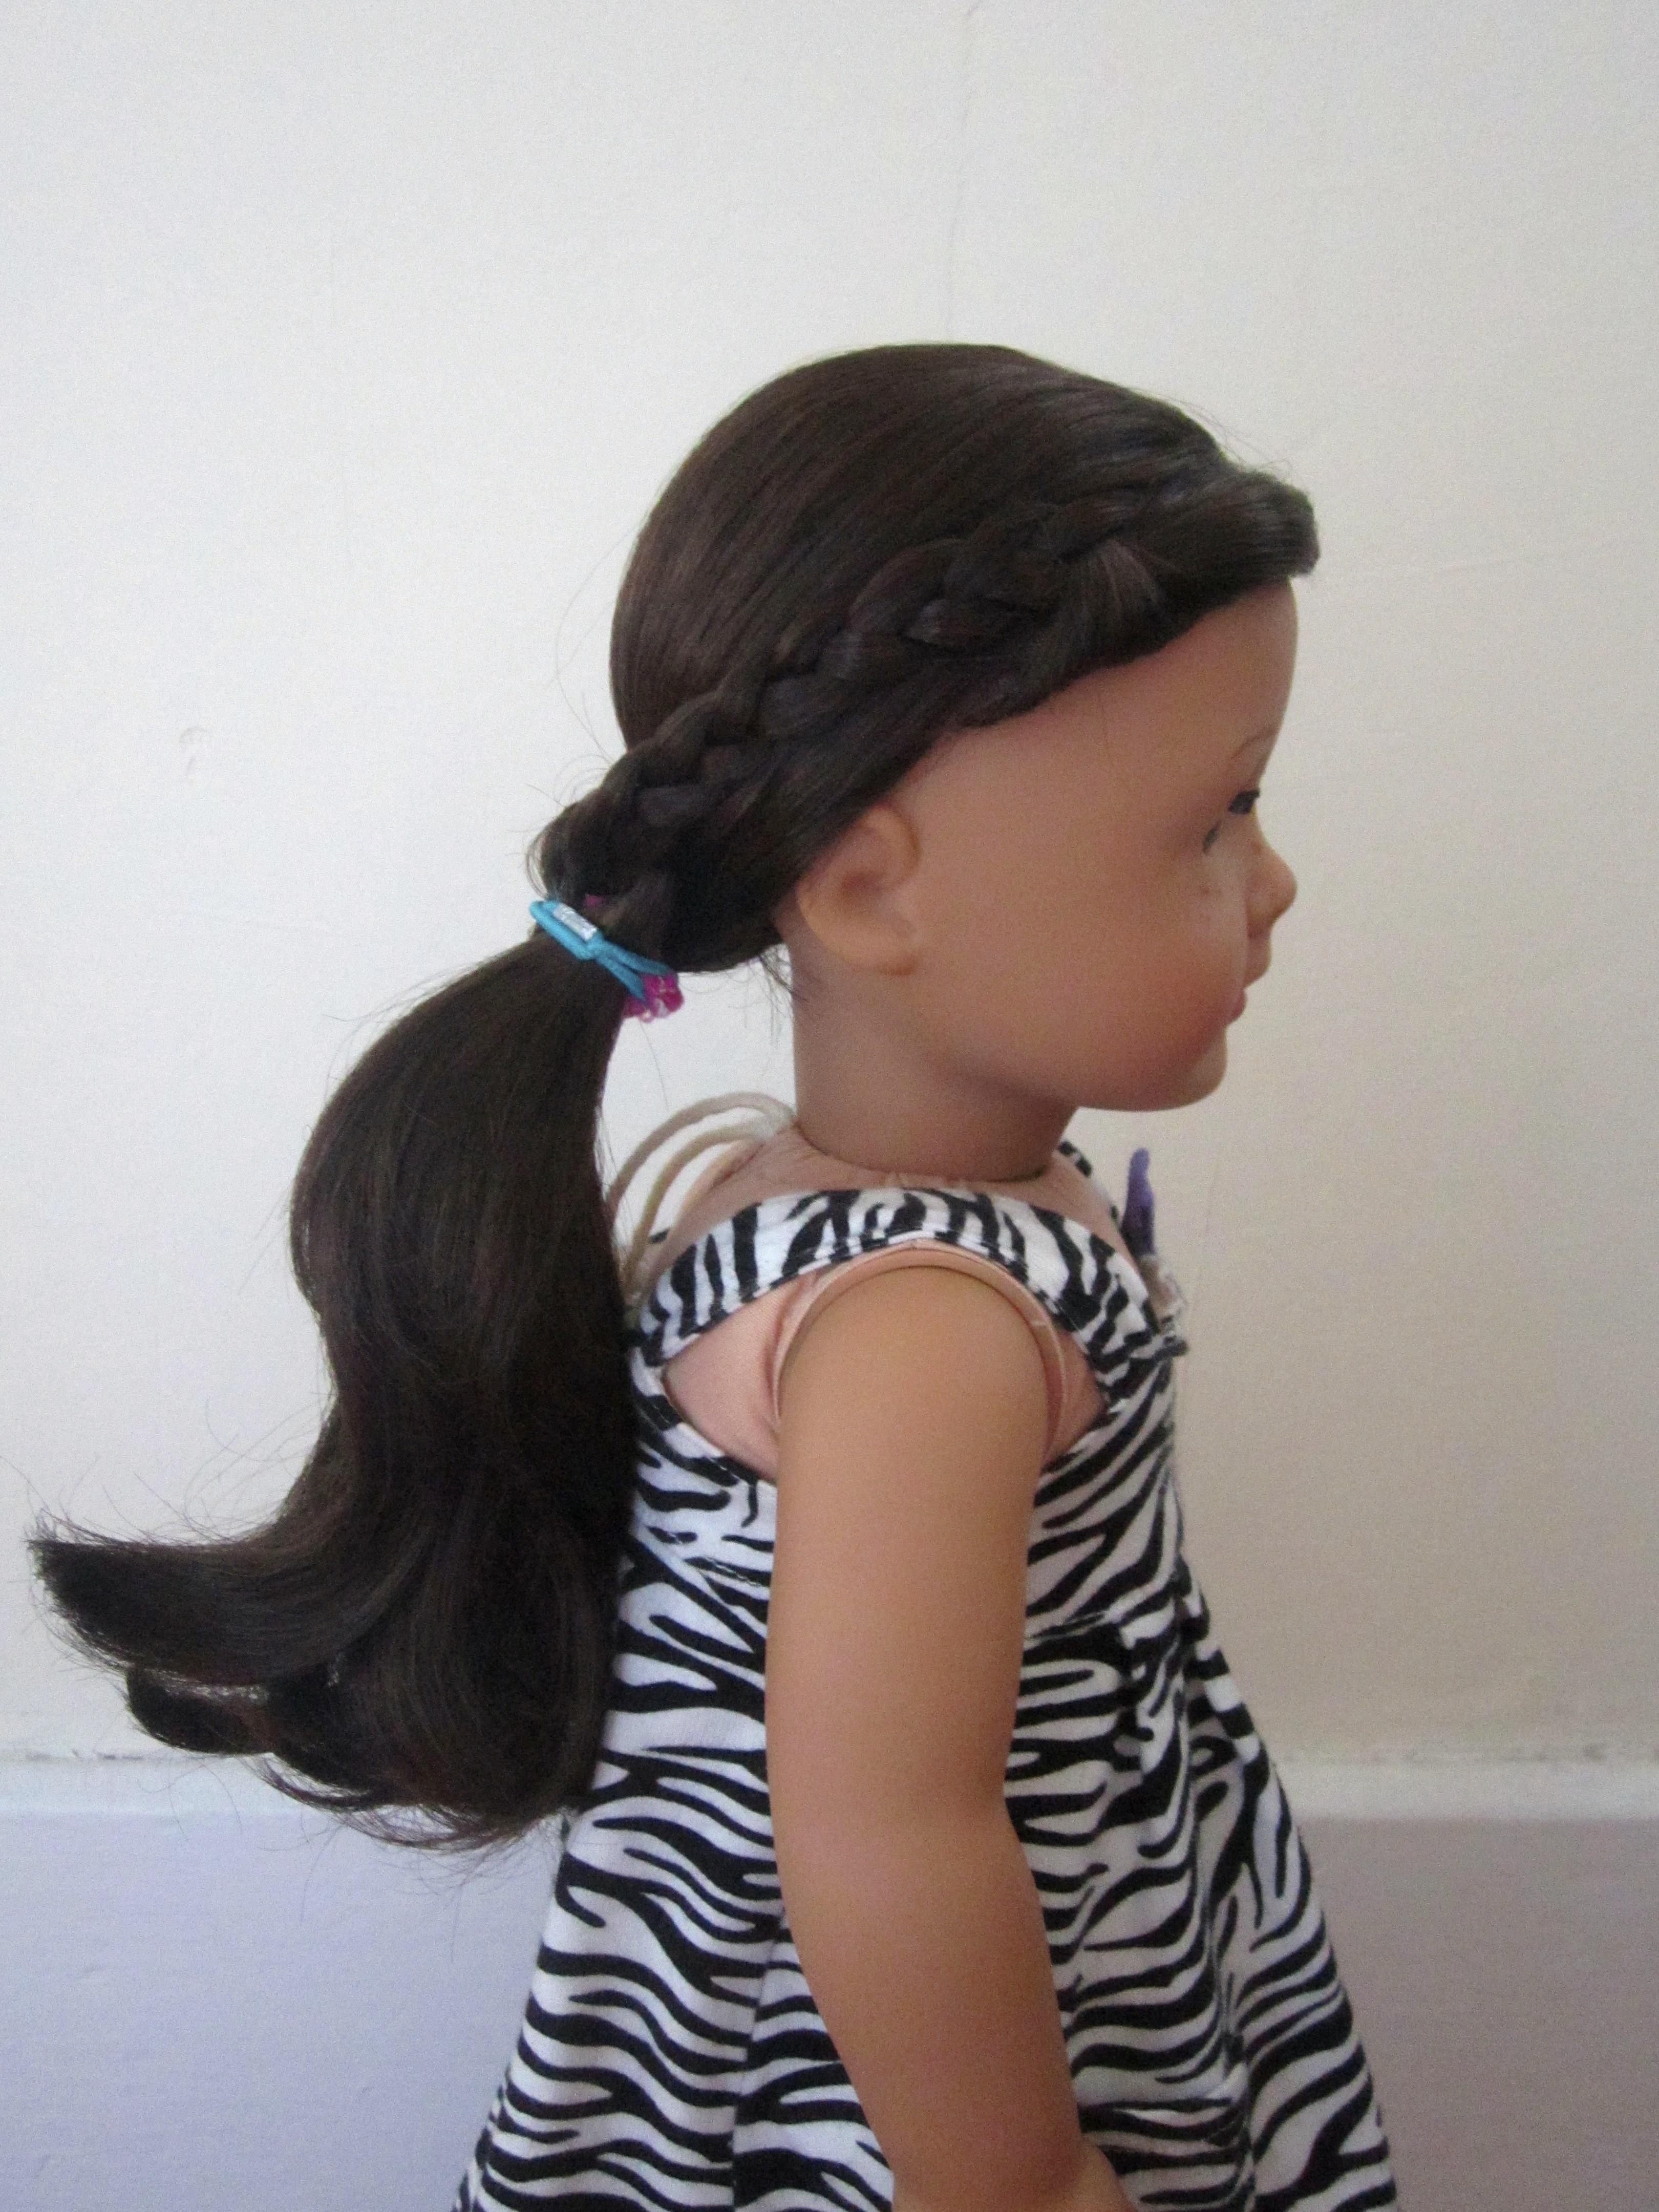 Meryland White Modern Kitchen Island Cart Doll Hair Before And After Before And After Hair Care 01